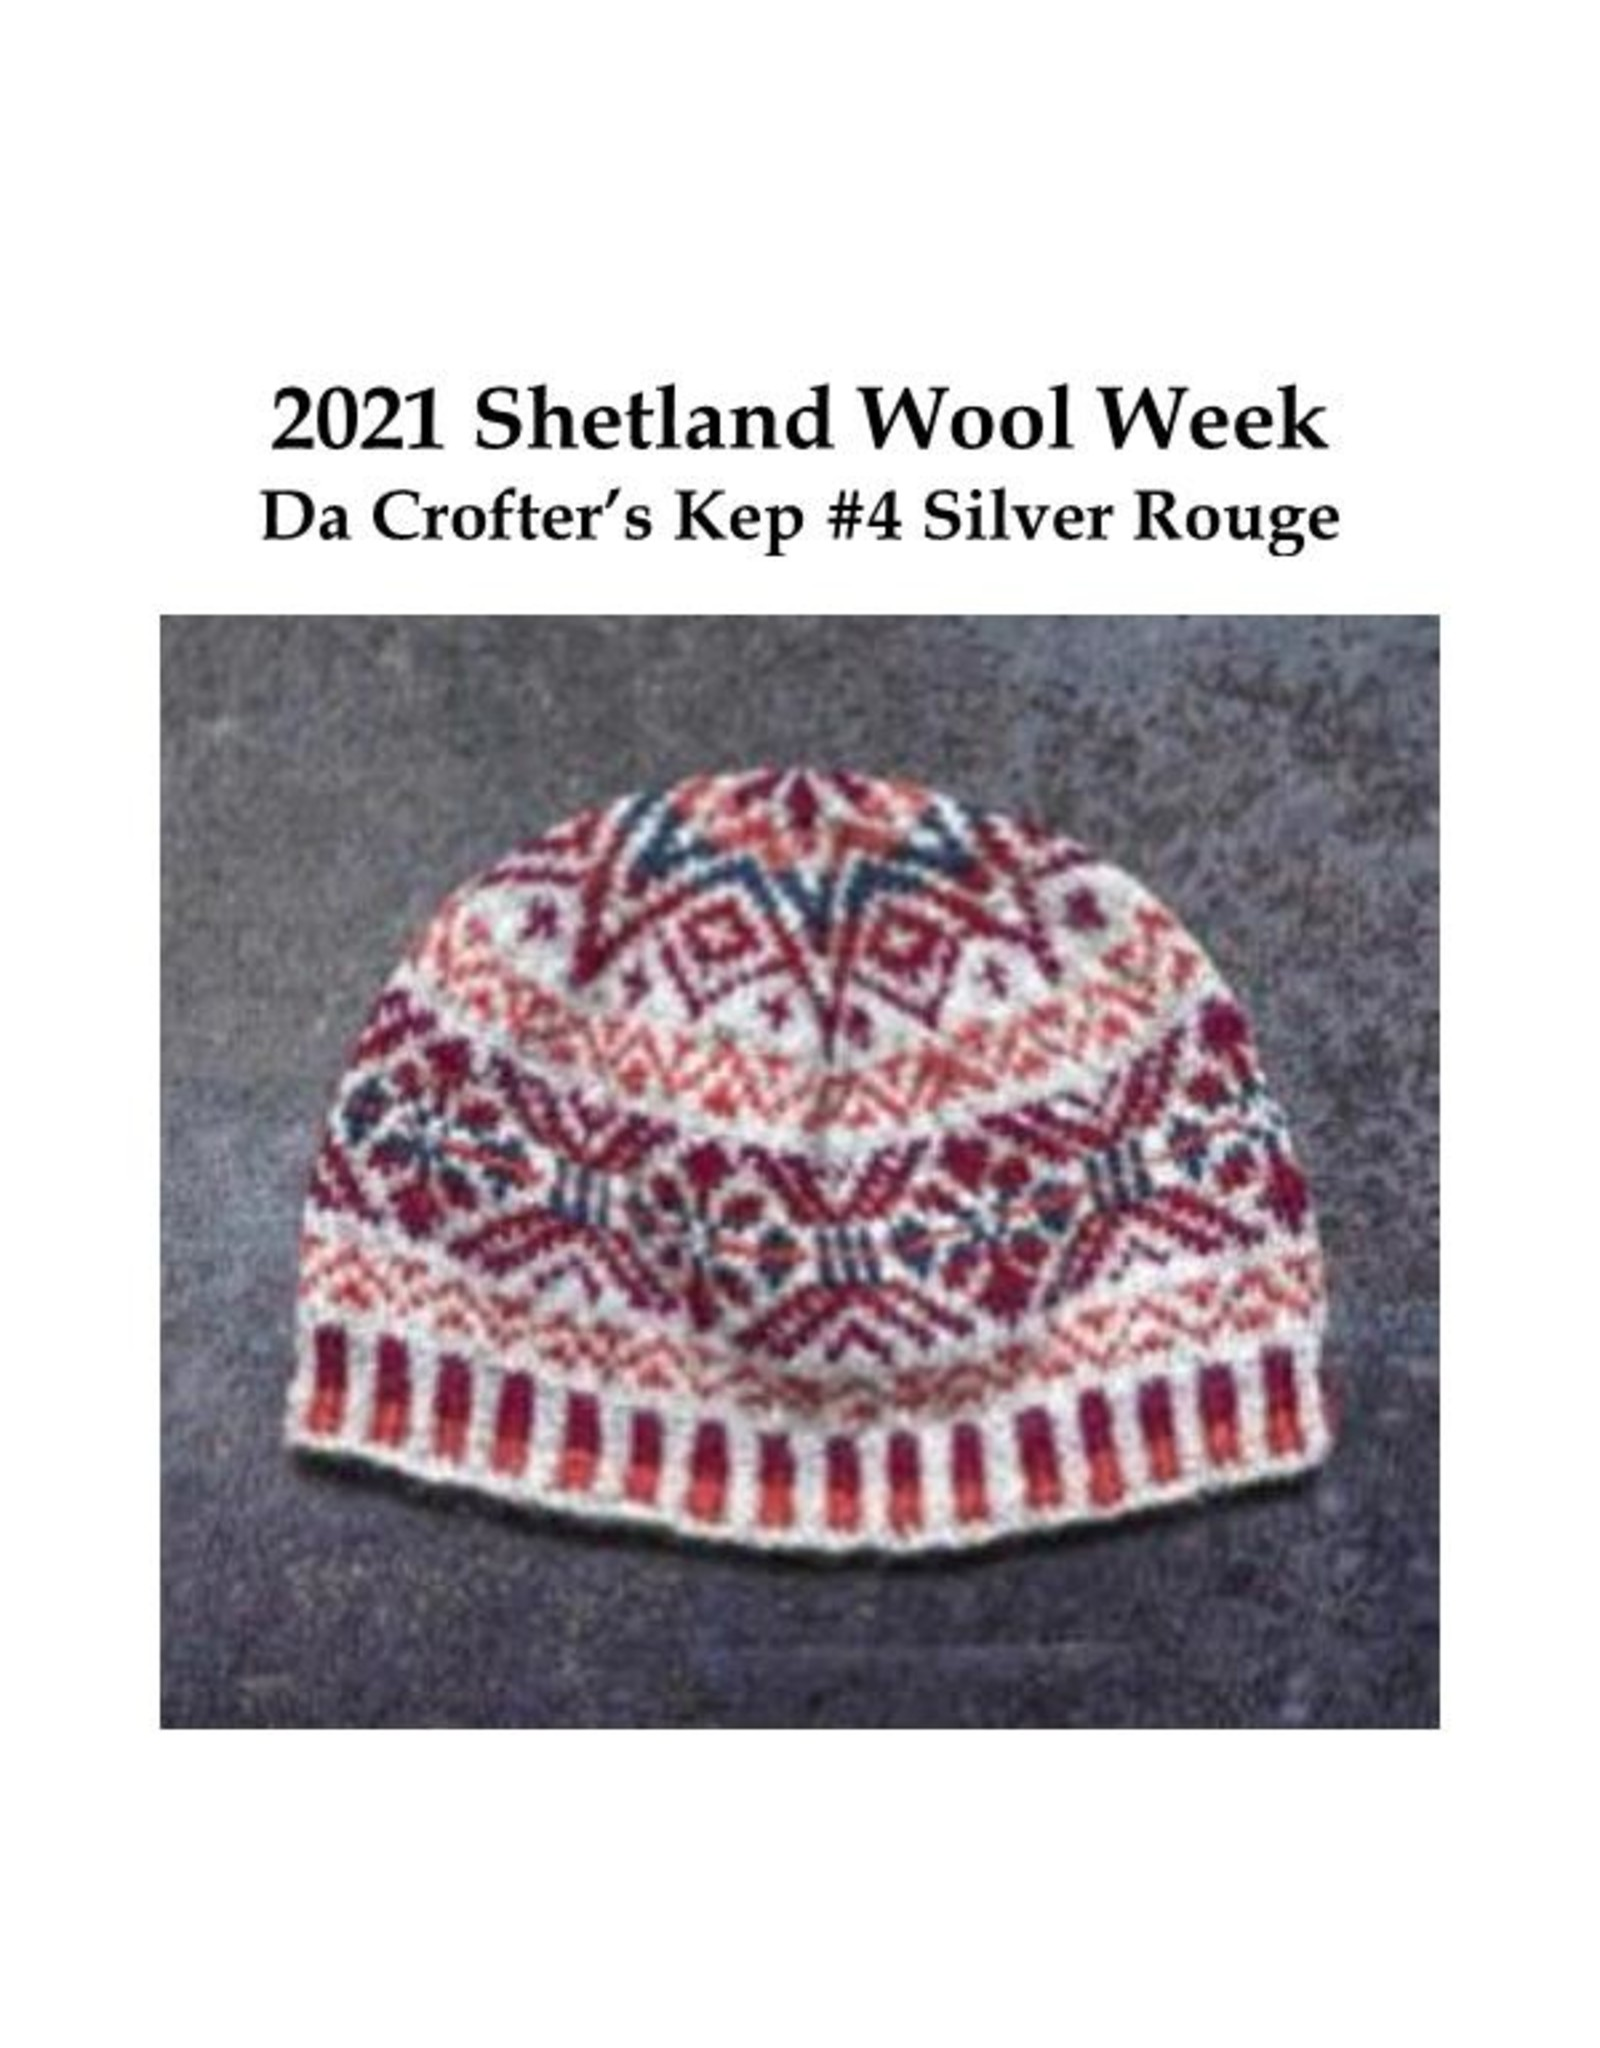 Jamieson's of Shetland Shetland Wool Week Kit 2021